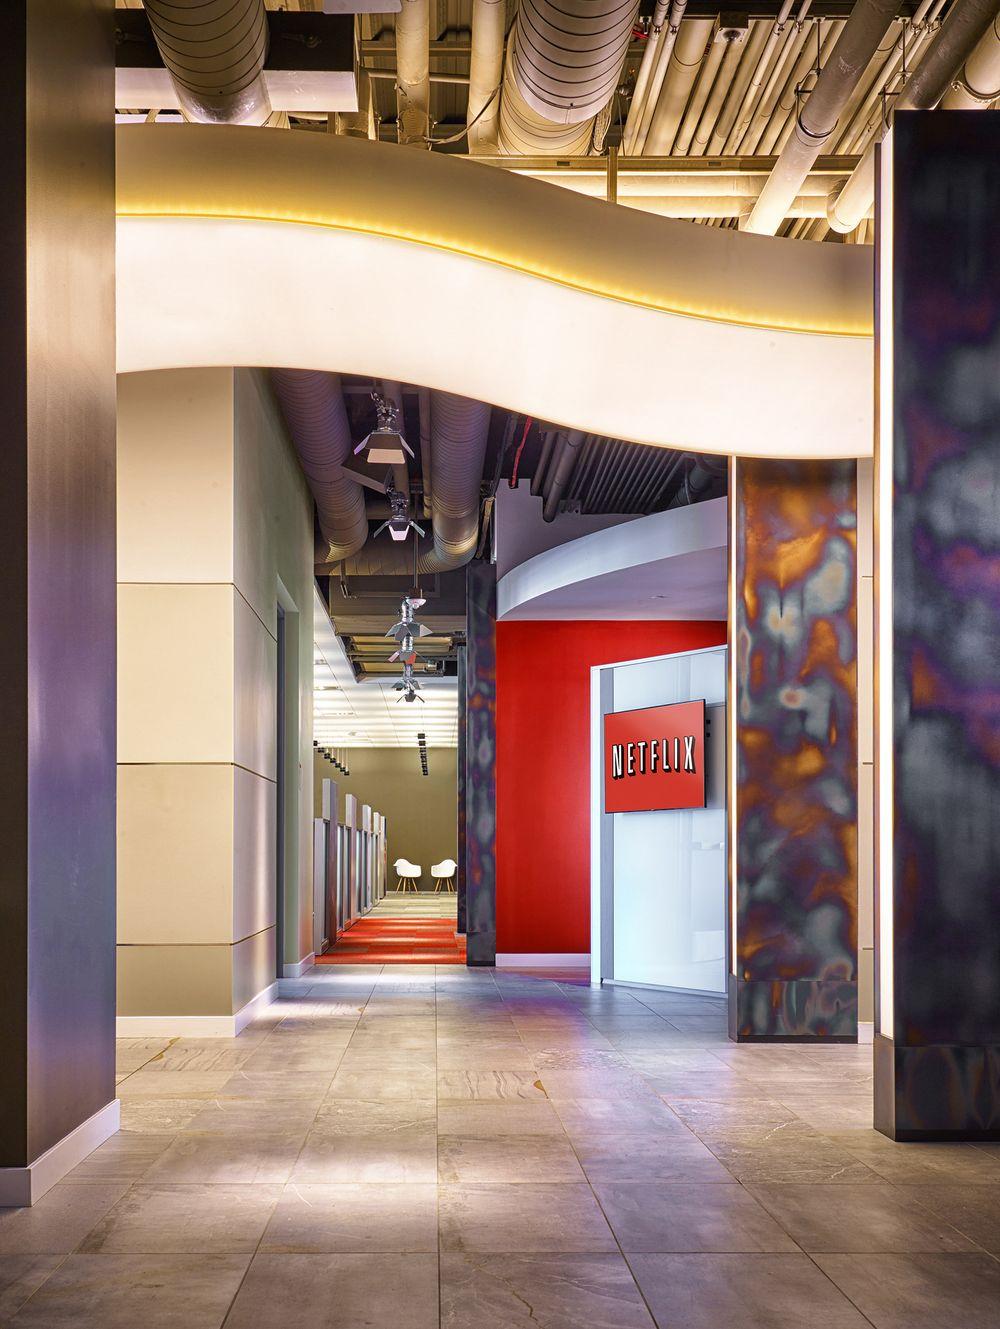 Netflix Headquarters Hallway